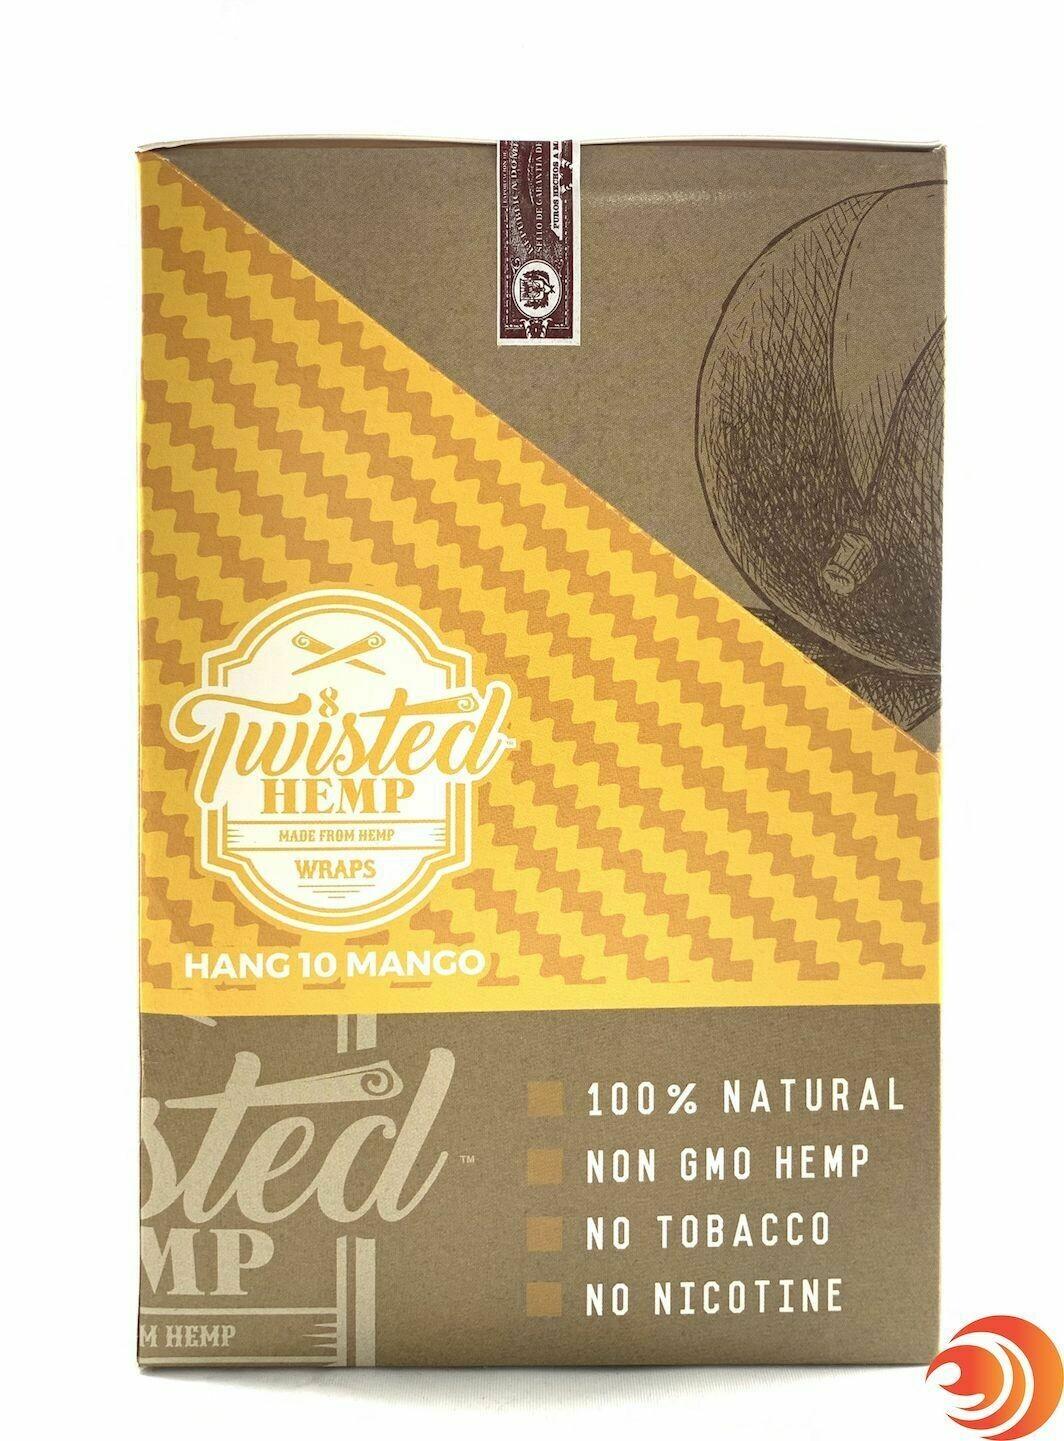 Twisted Hemp Wraps - Hang 10 Mango